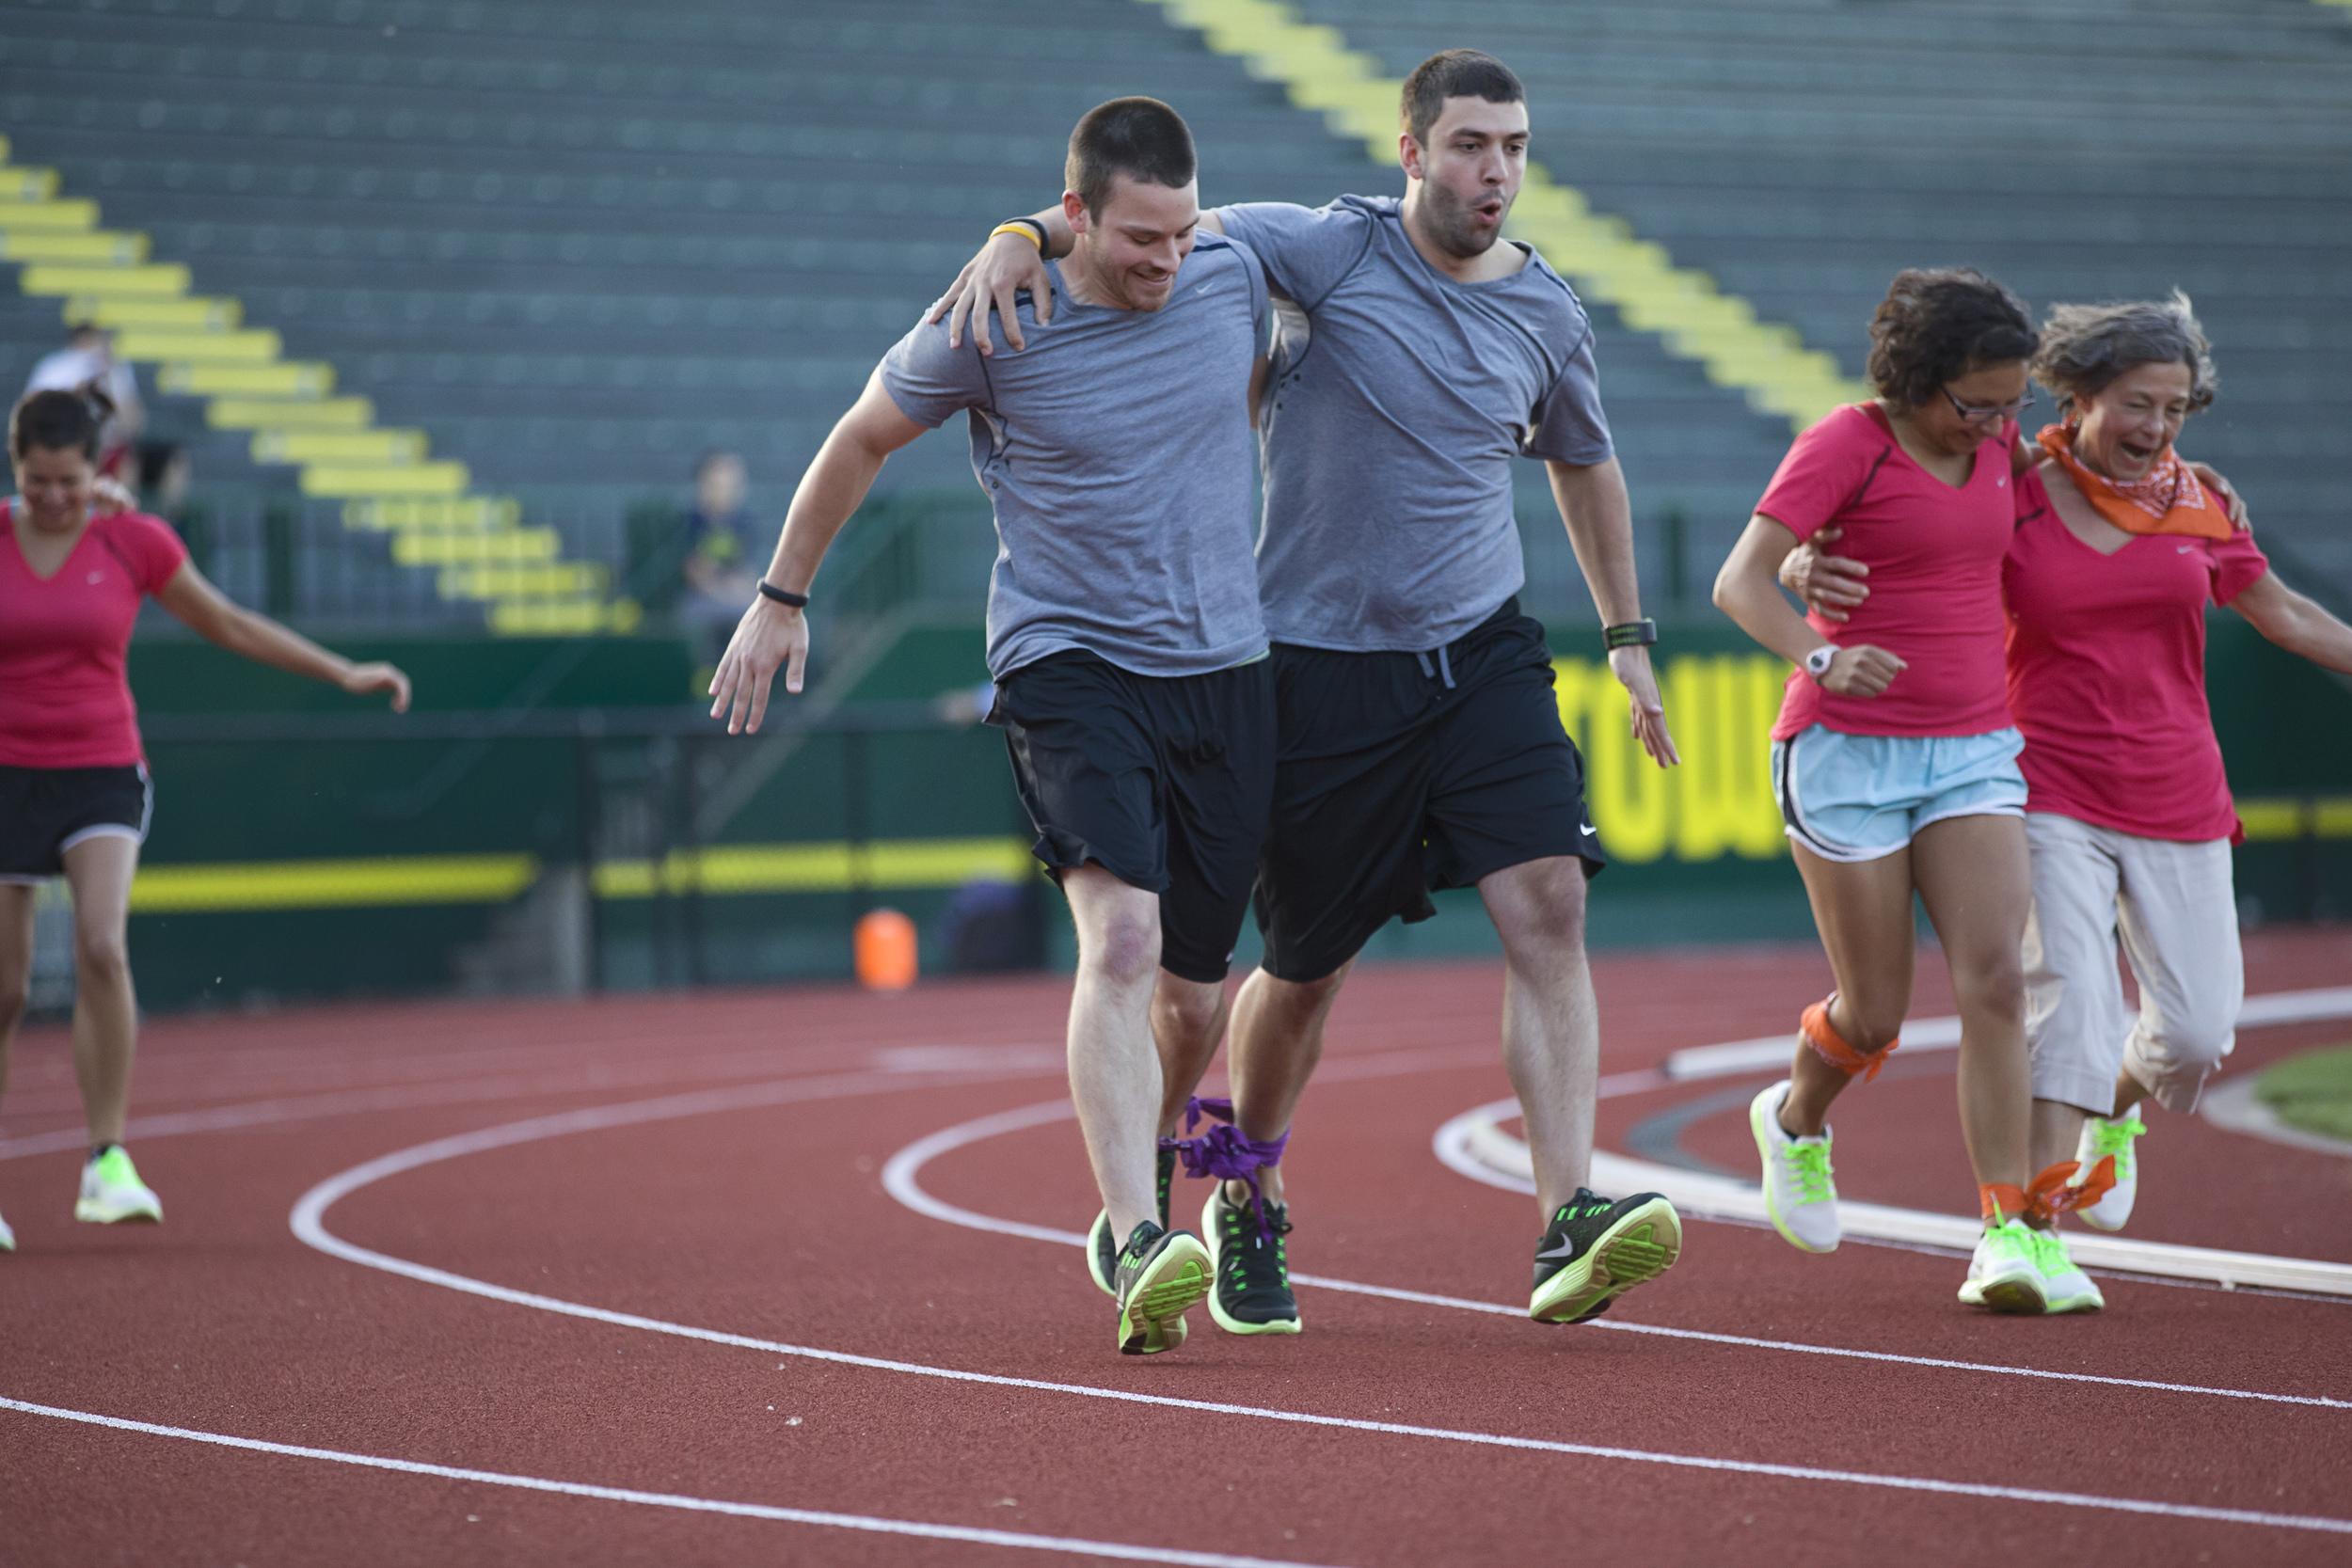 20120610Nike_Running_Olympic_Trials_University_Gia_Goodrich_Photos409.jpg